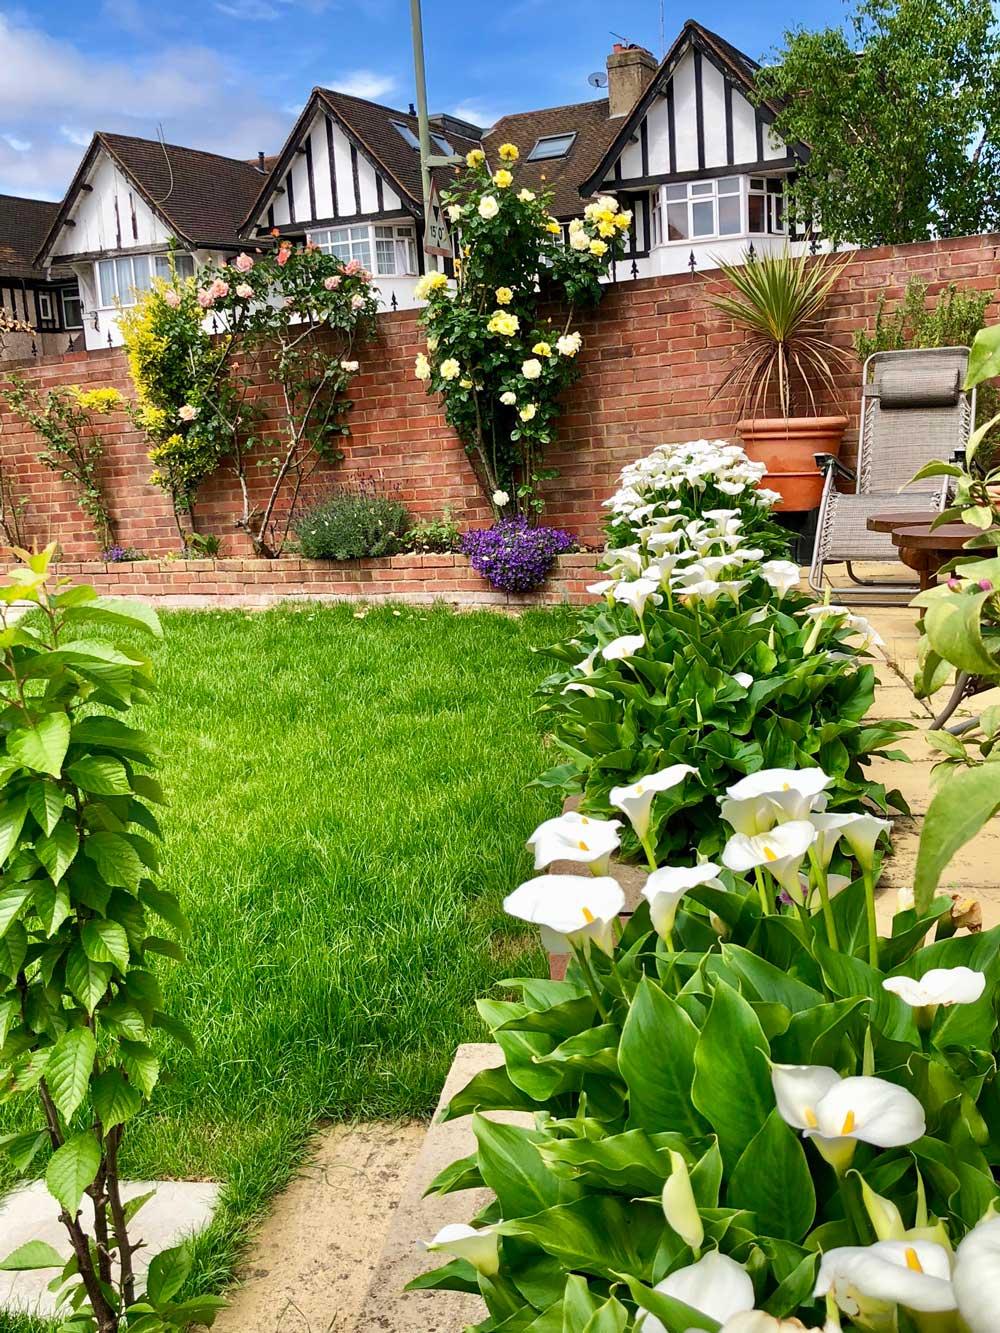 Home garden flowers